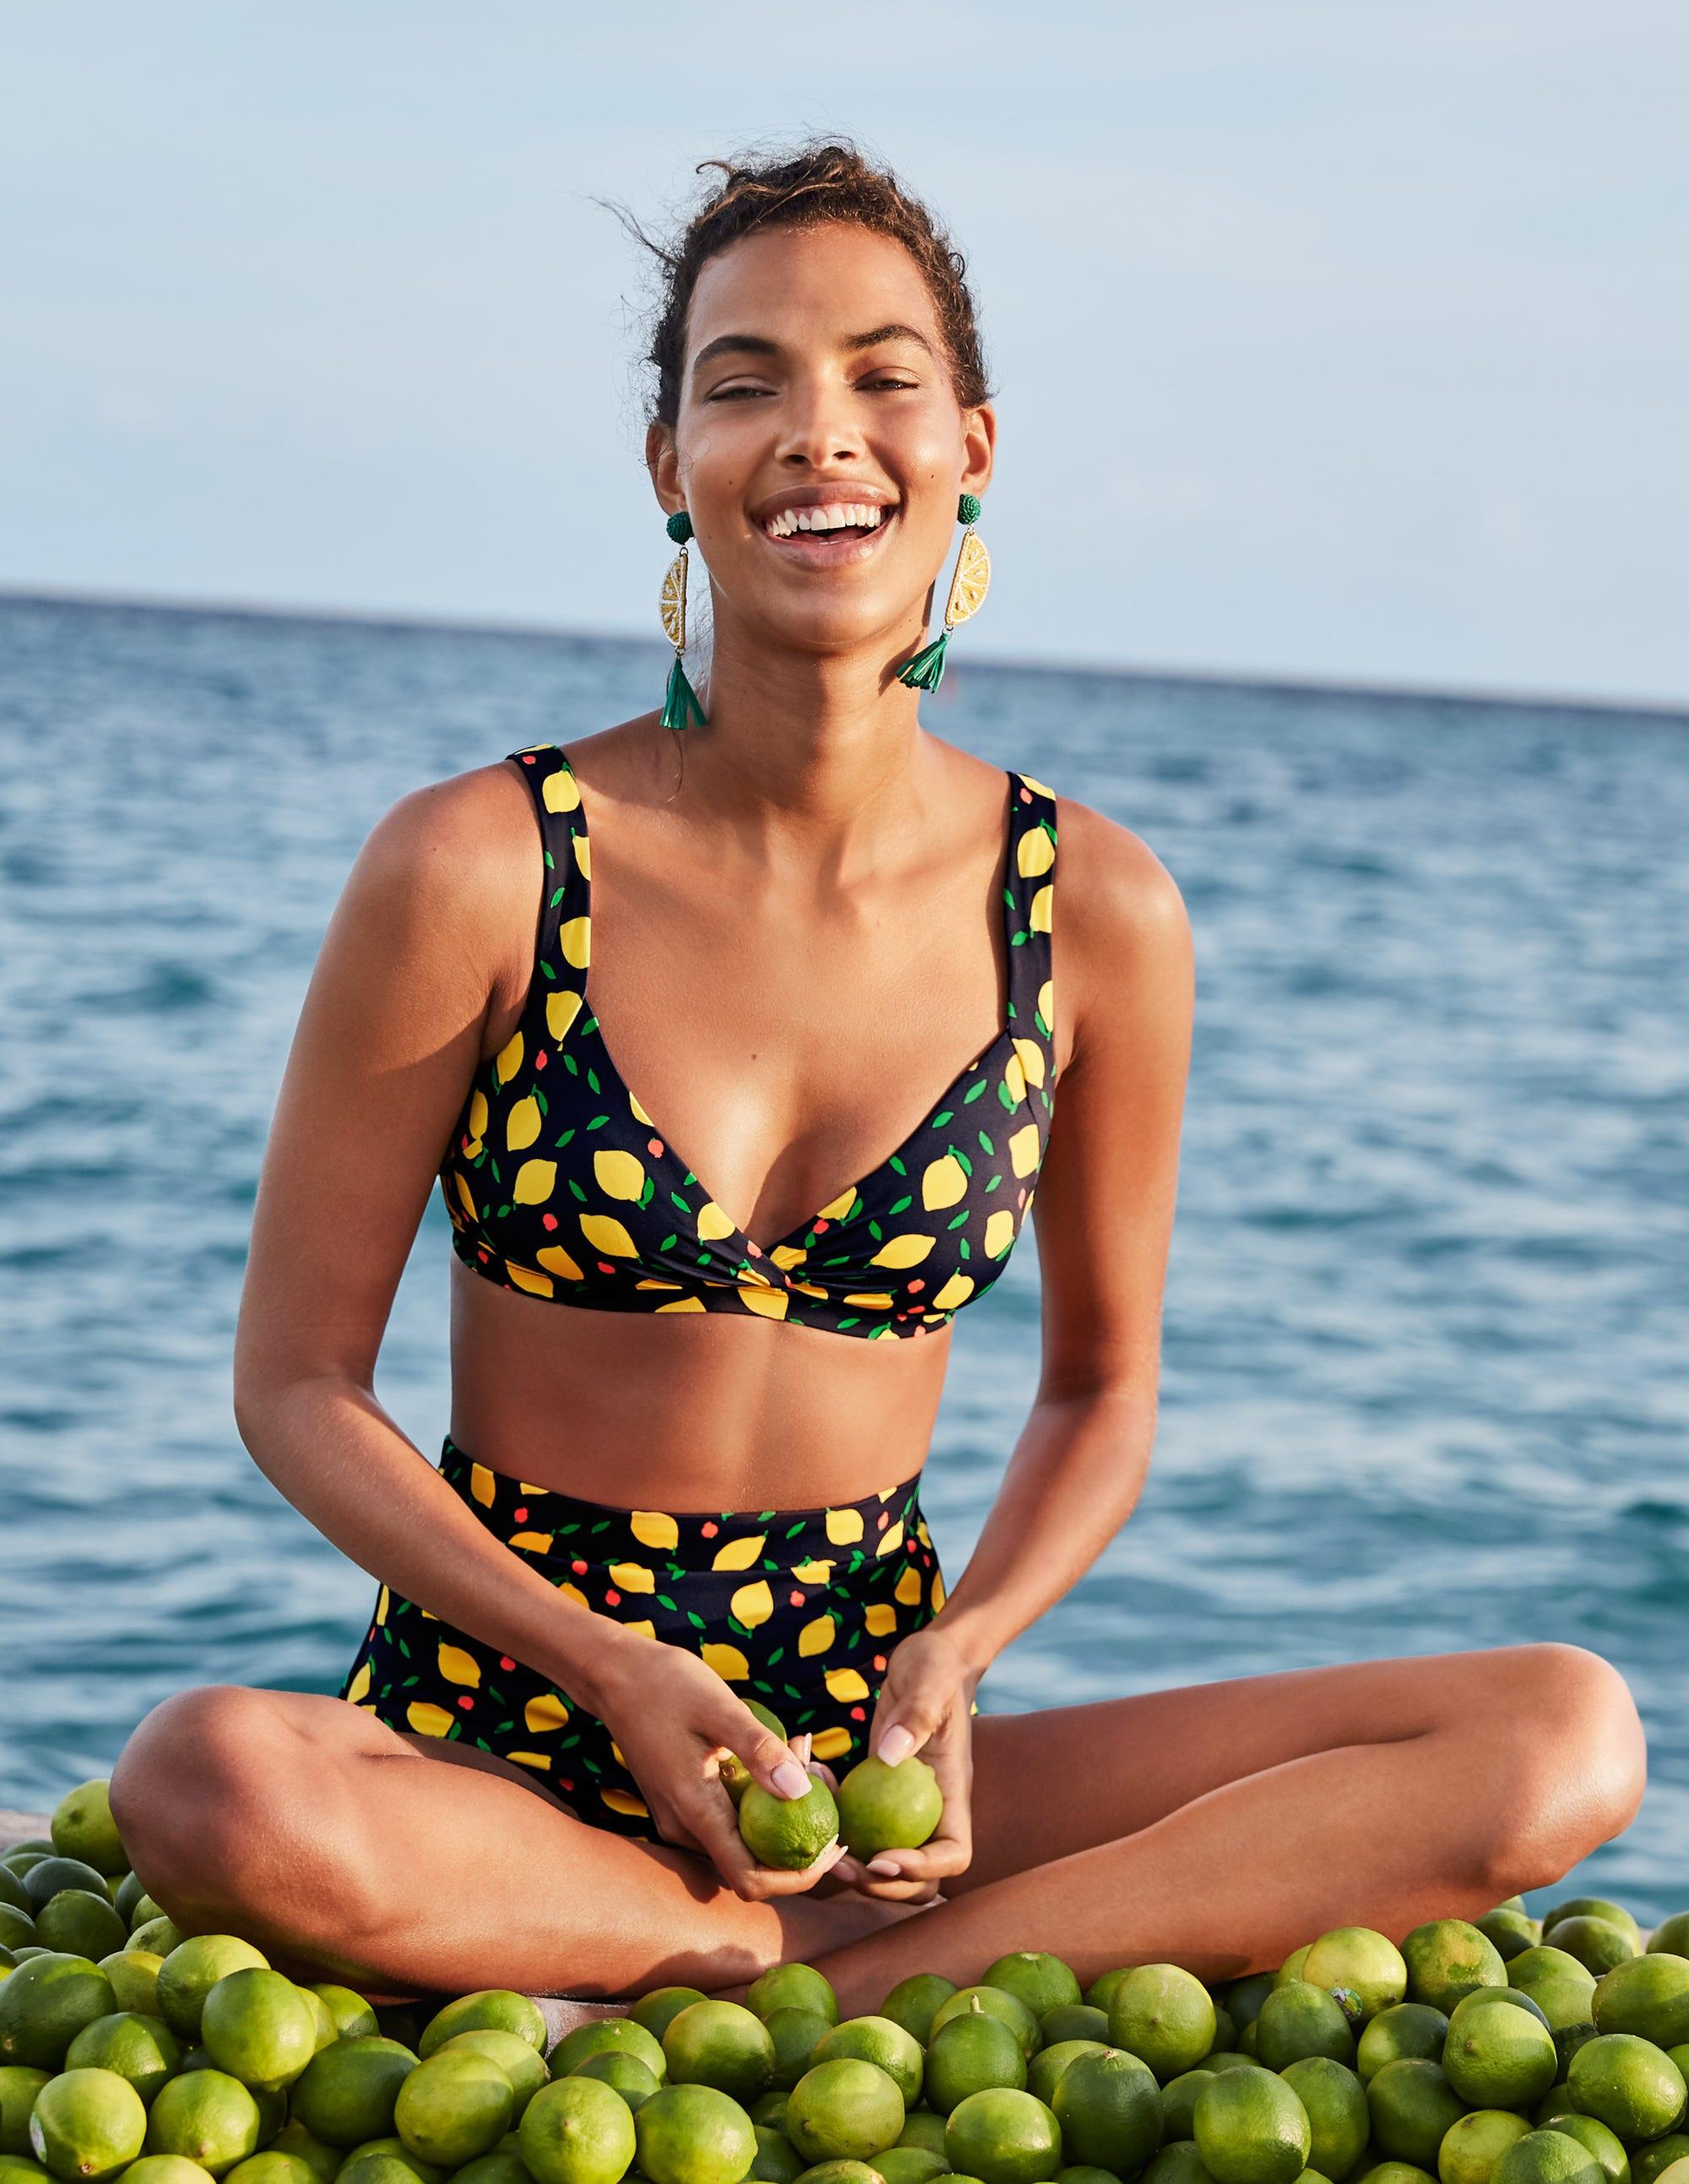 Boden Talamanca Bikini Top - Navy, Lemon Fruit